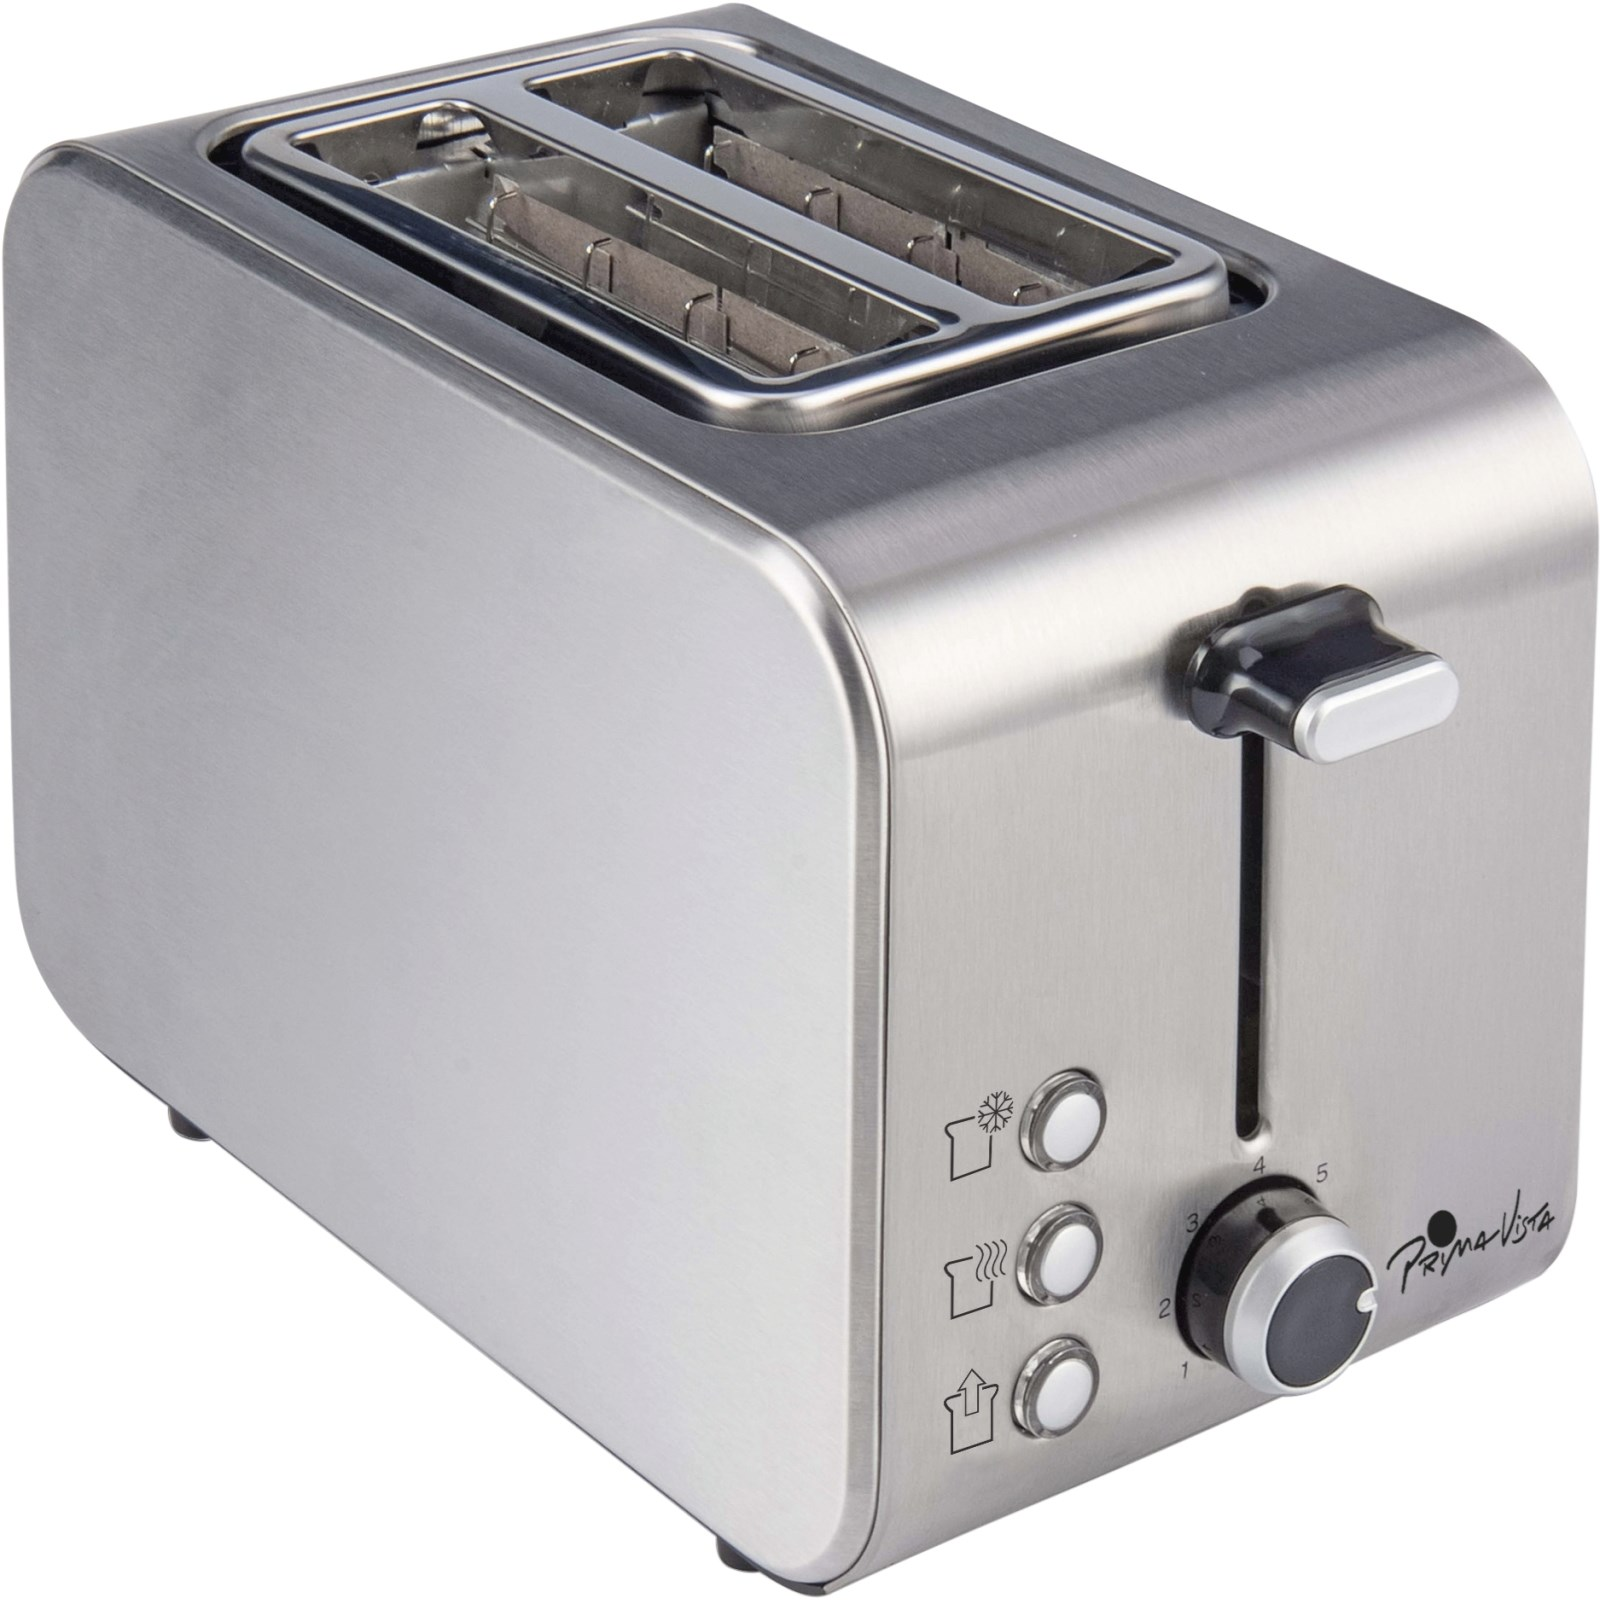 Toaster Prima Vista 850 W - Elektro- Küchengeräte - LANDI